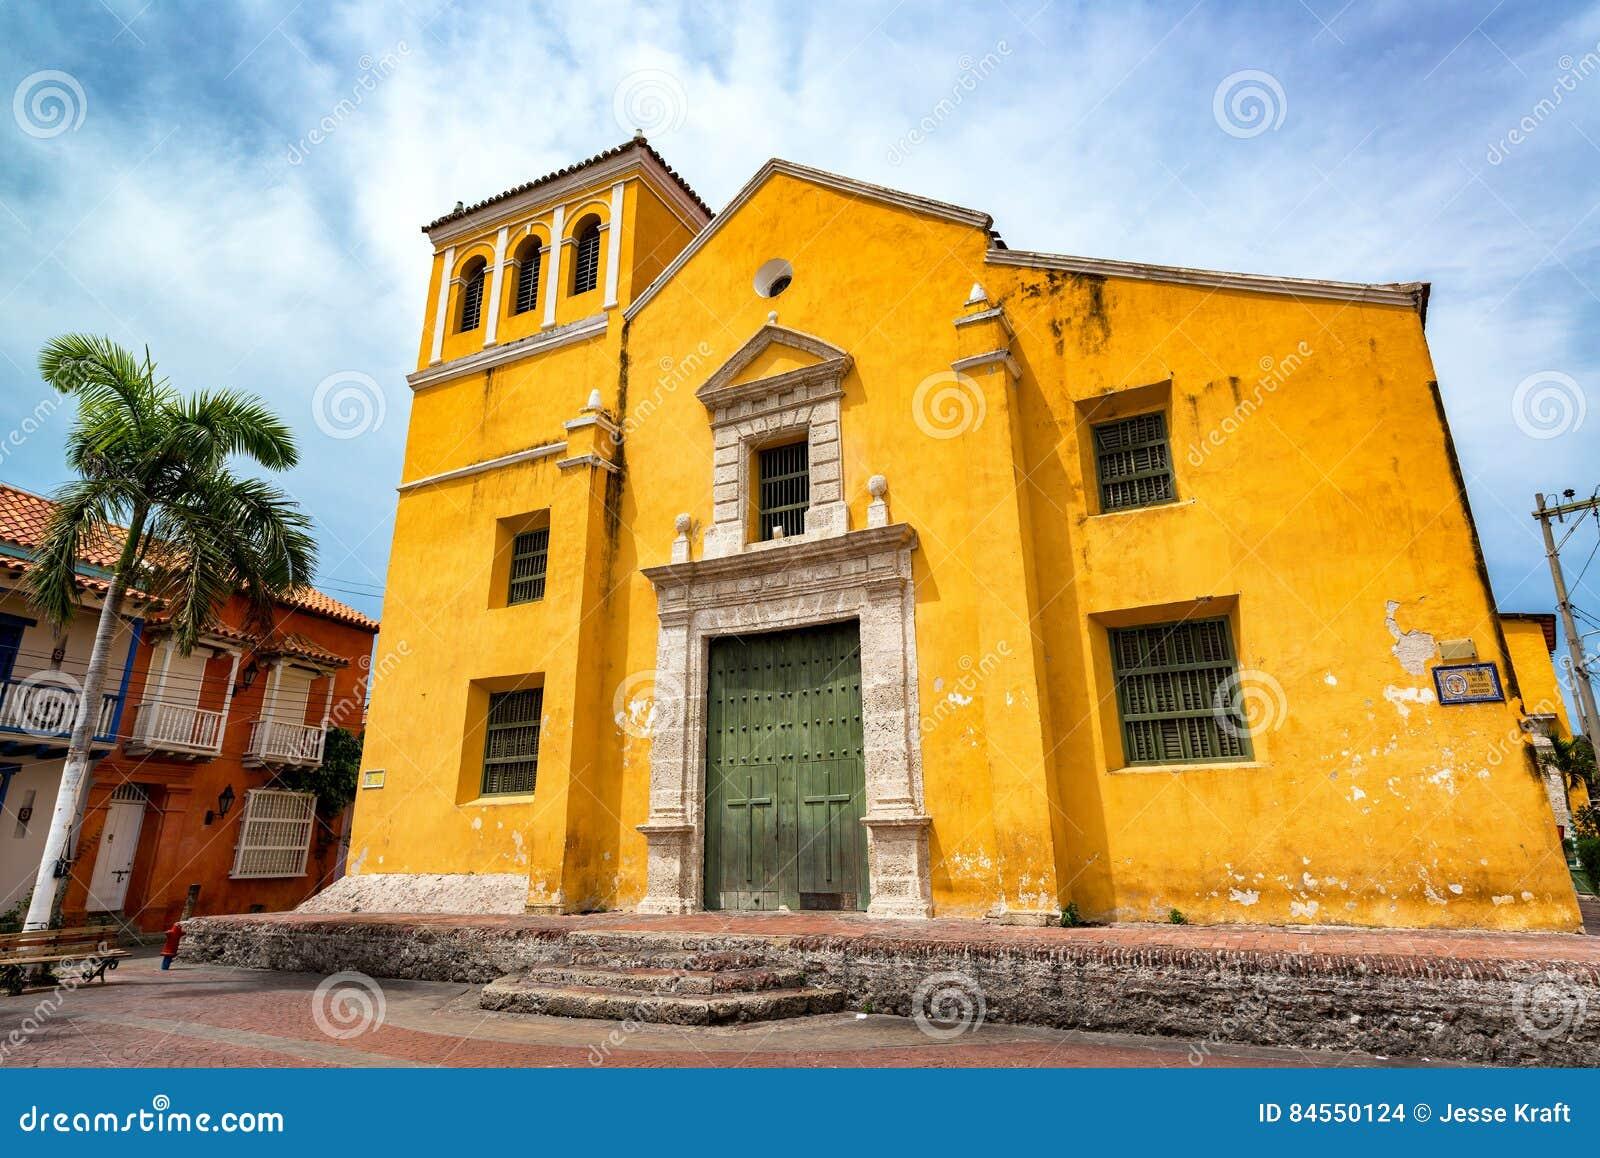 Kościół w Trinidad placu